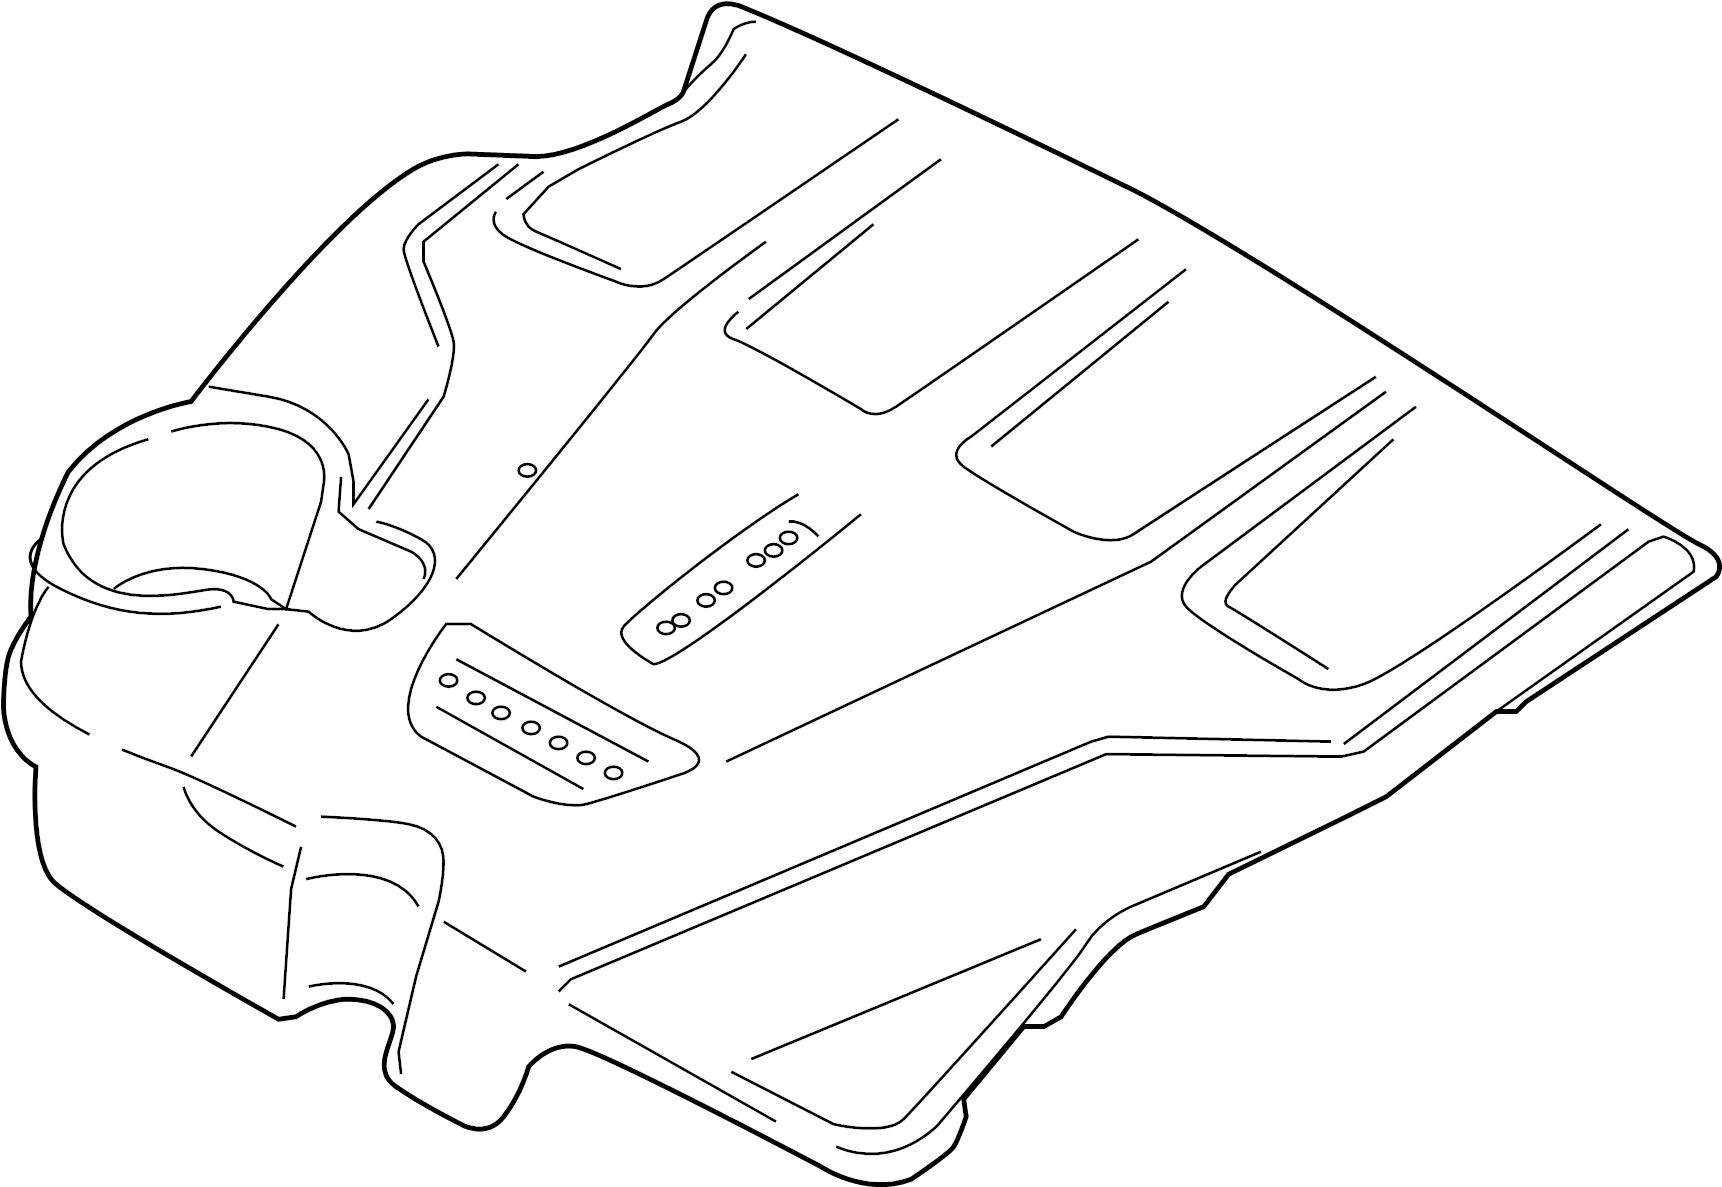 Lincoln Mkz Engine Cover 2 7 Liter 3 0 Liter Transaxle